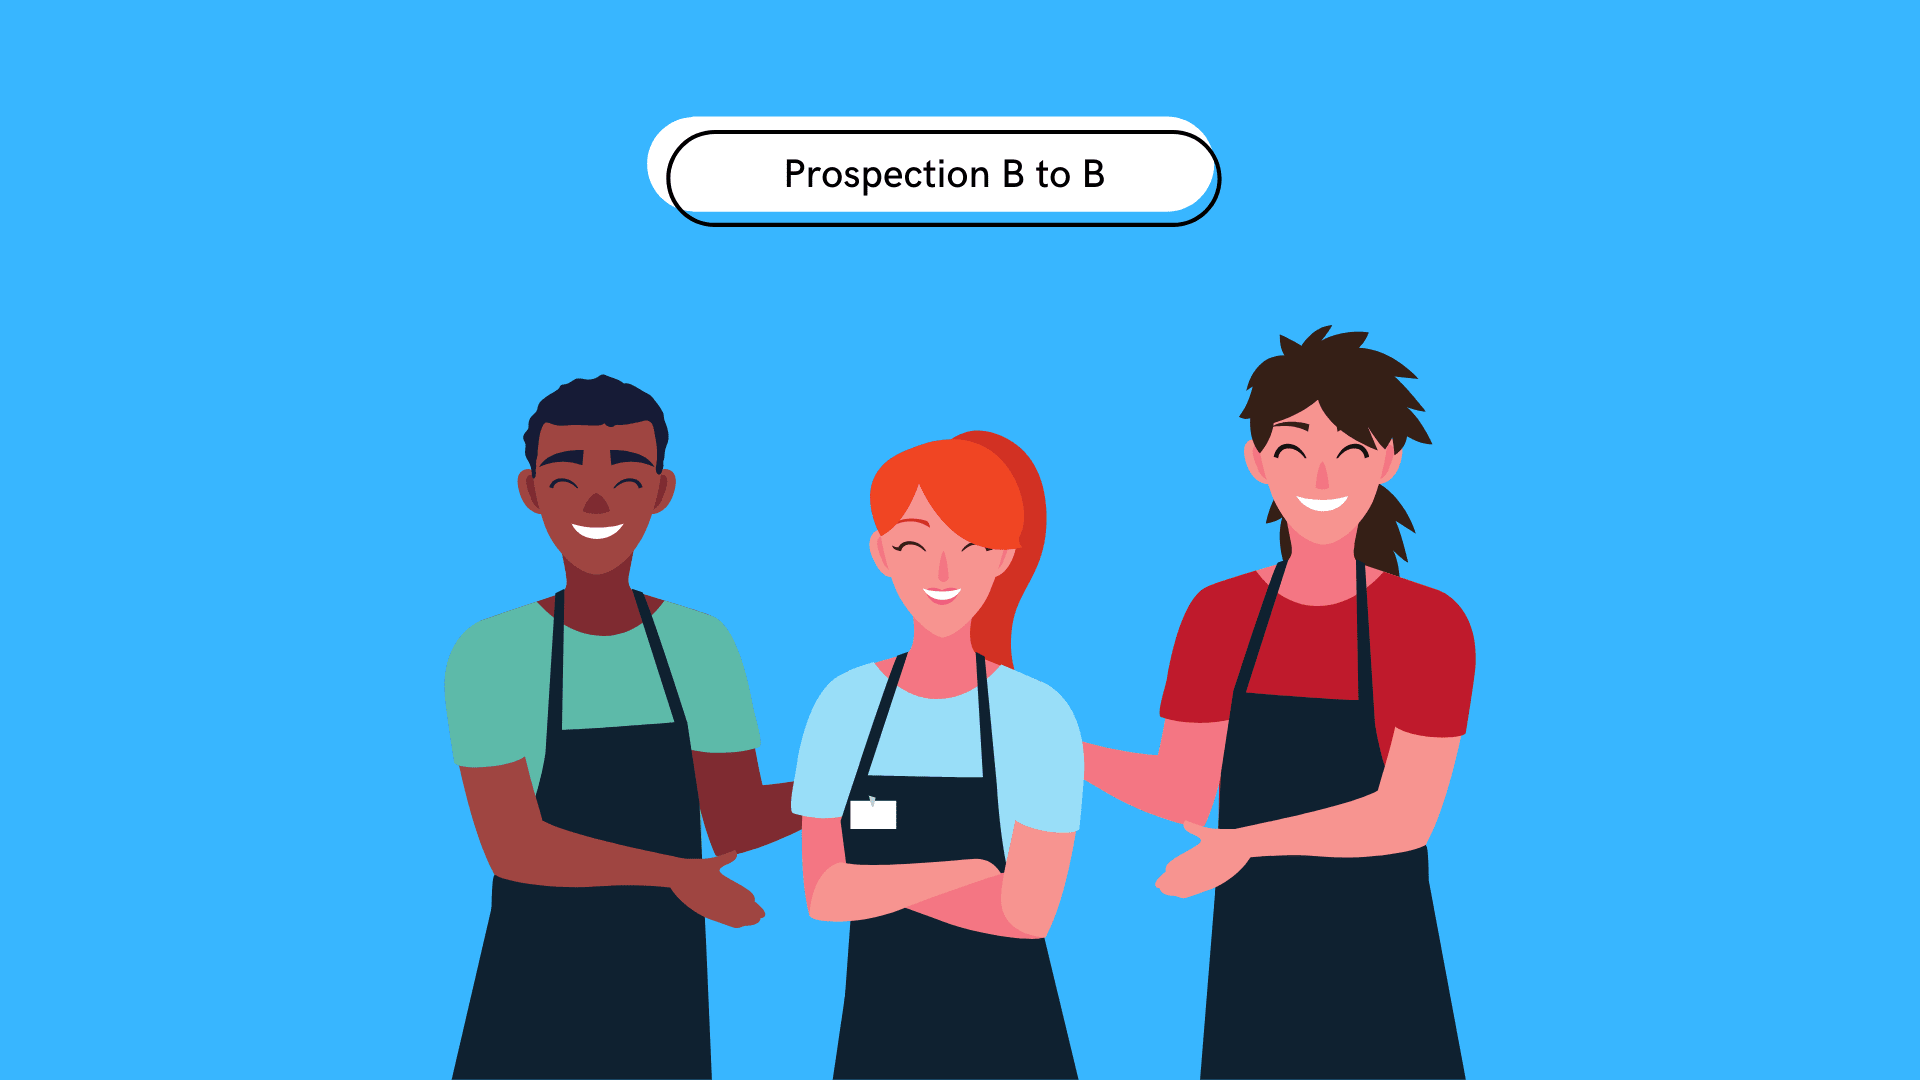 Prospection B to B